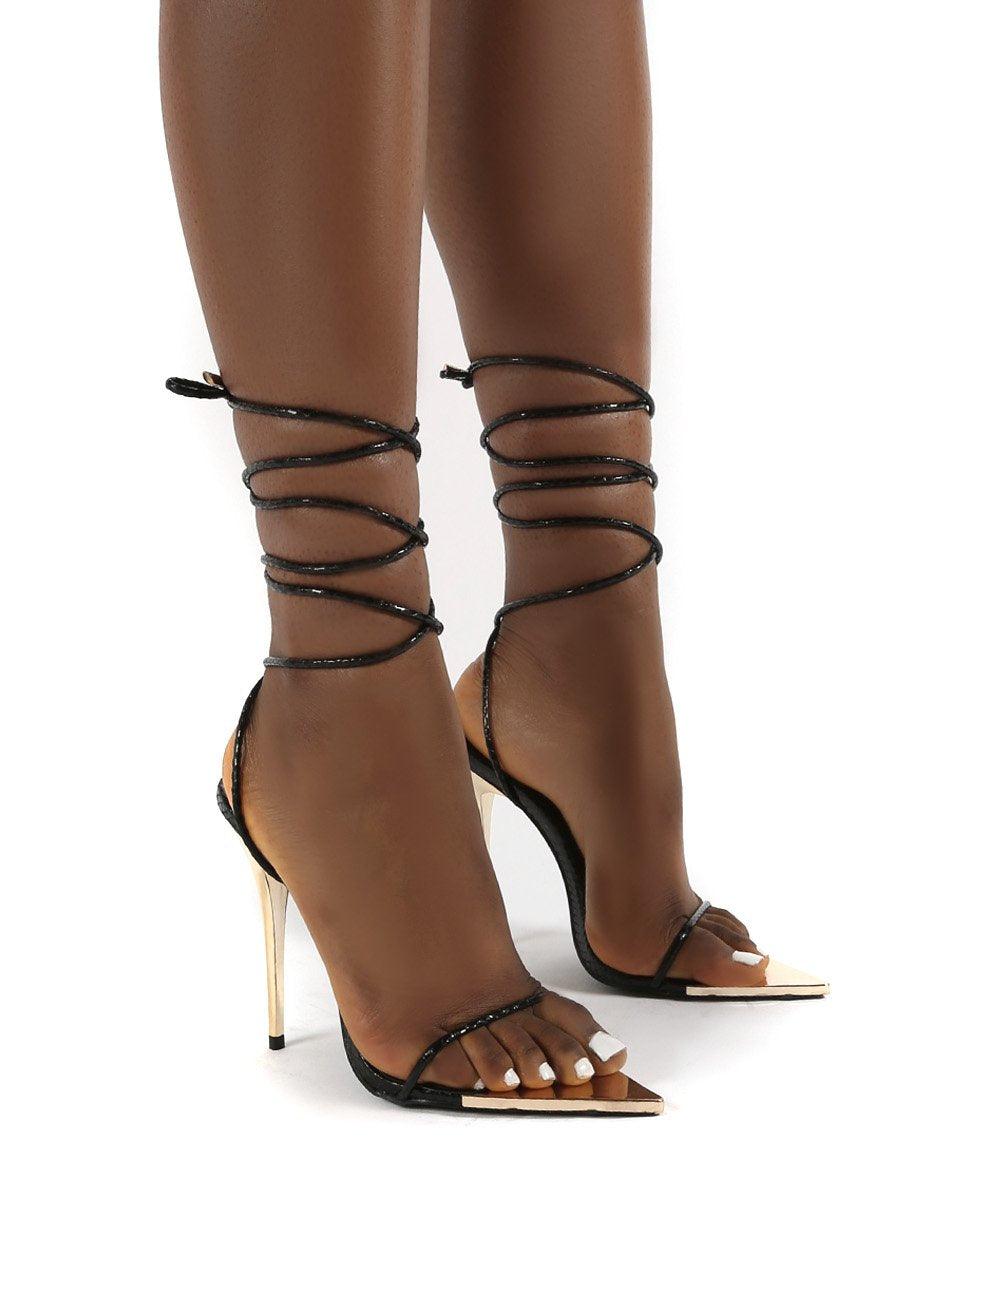 Public Desire US Influenced Black Wrap Around Leg Court High Heels - US 7